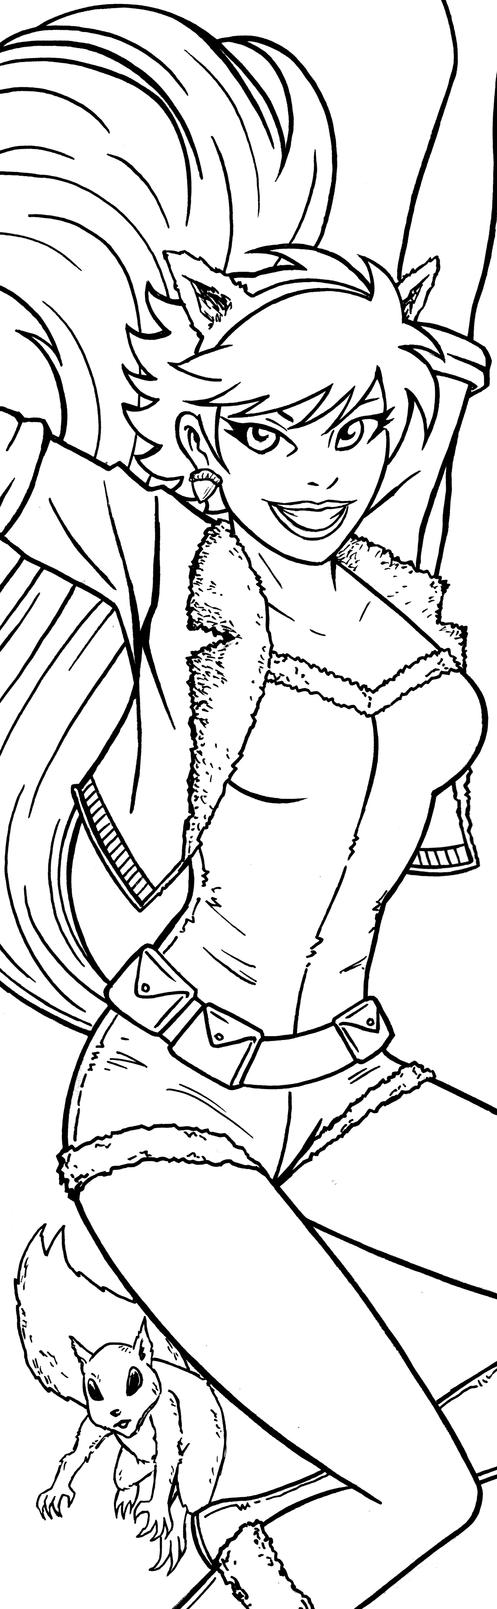 Squirrel Girl Art Inks by RichBernatovech